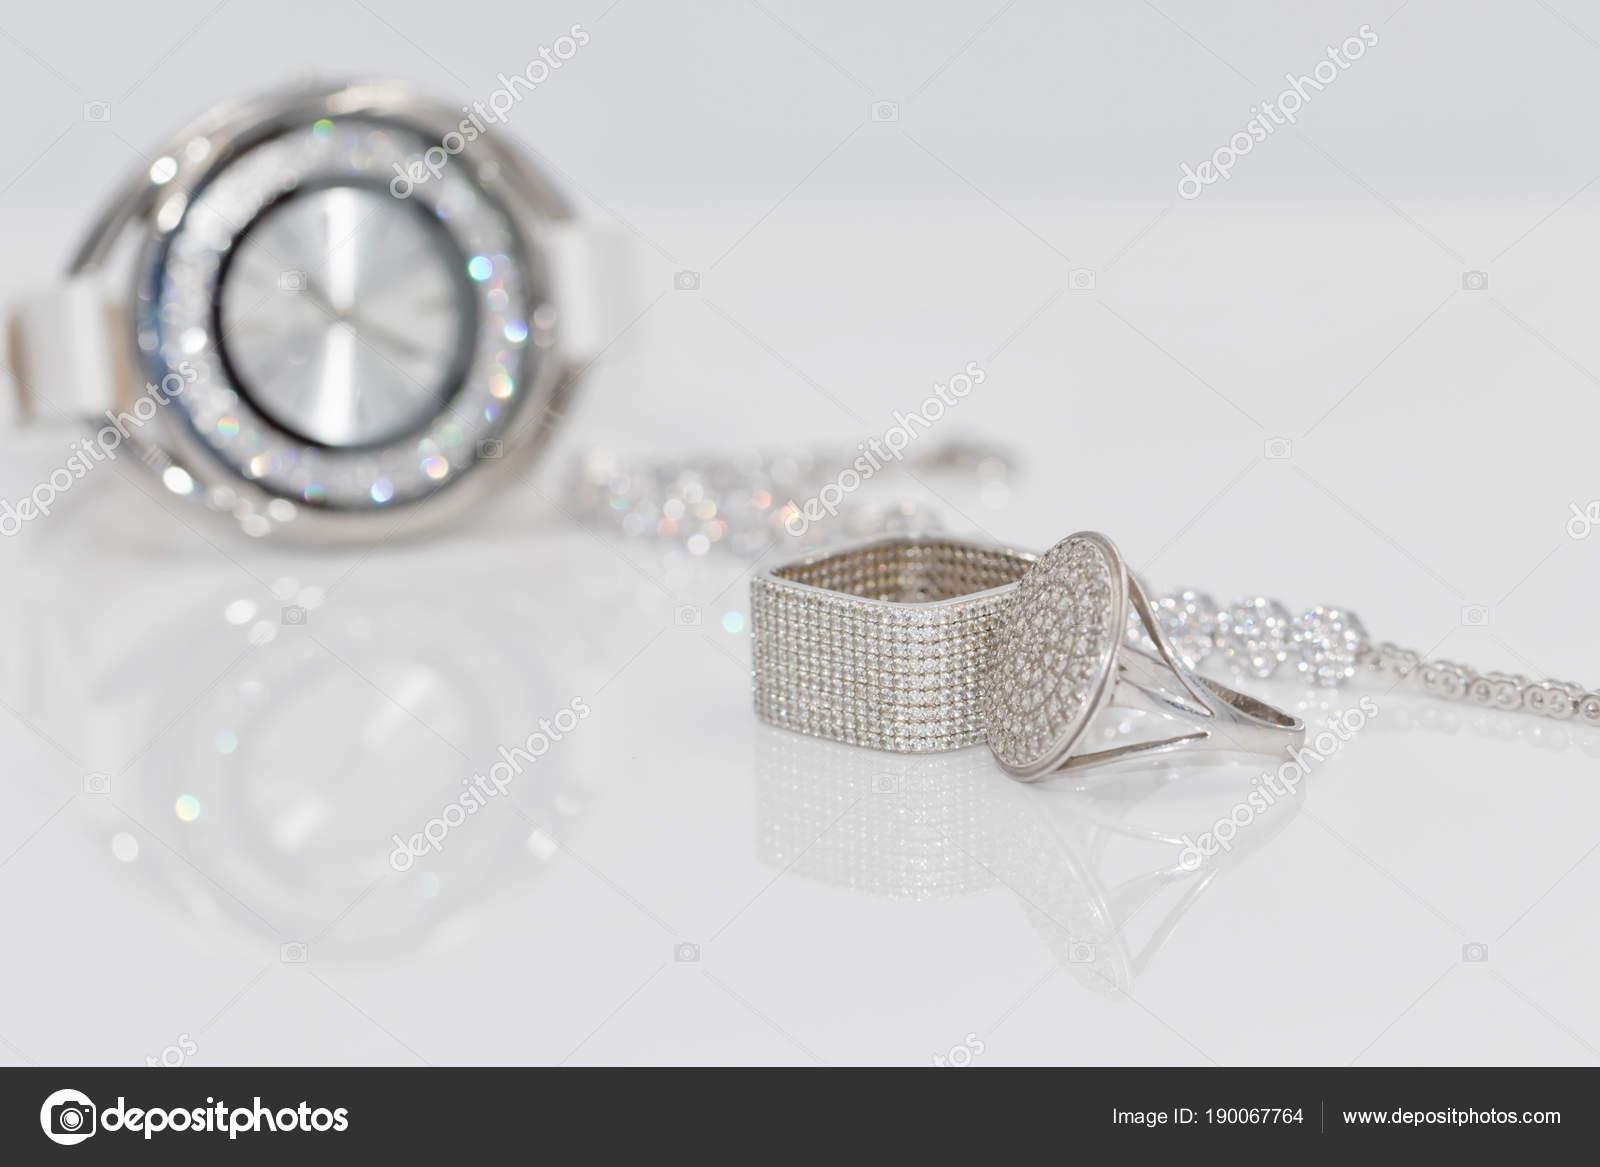 1d397633c97 Ασημένια δαχτυλίδια και σκουλαρίκια στο φόντο των ρολόγια ...